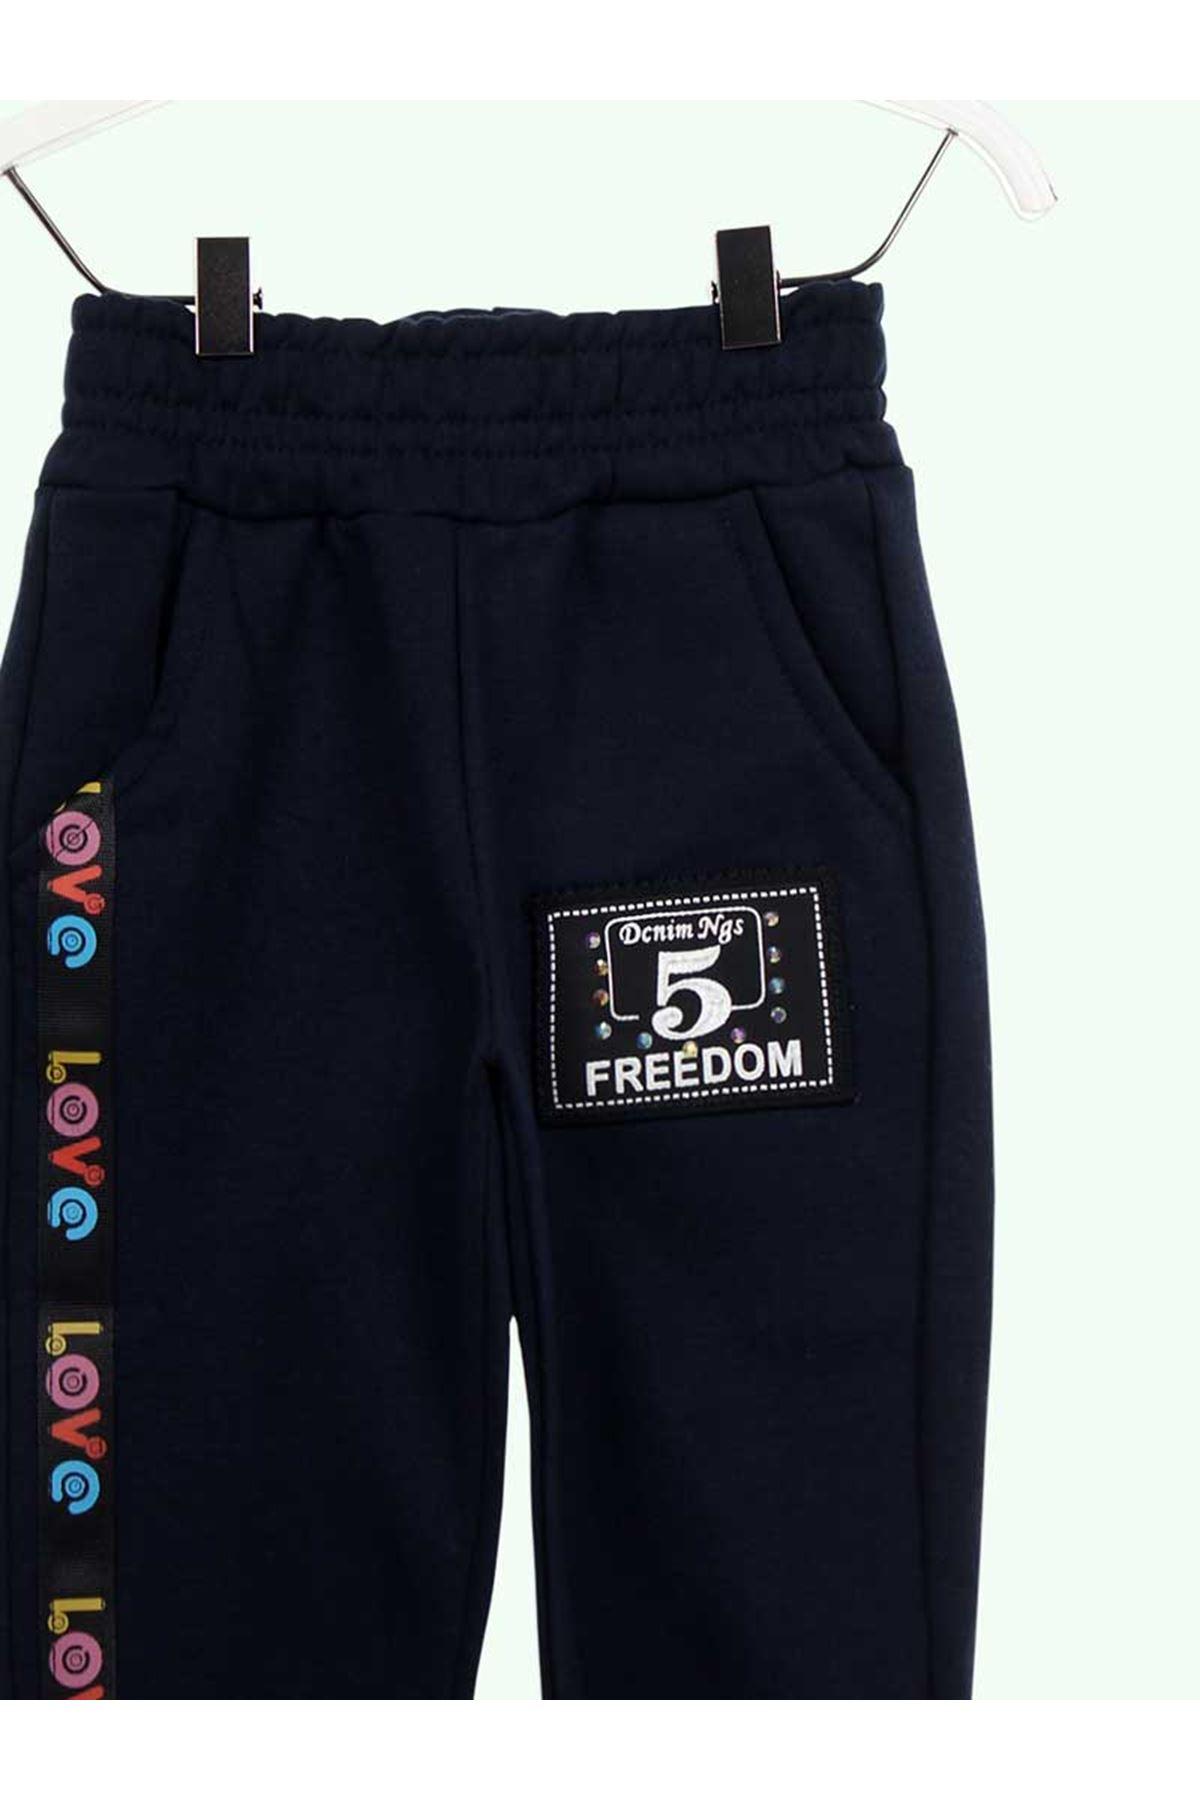 Navy Blue Female Child Sweatpants